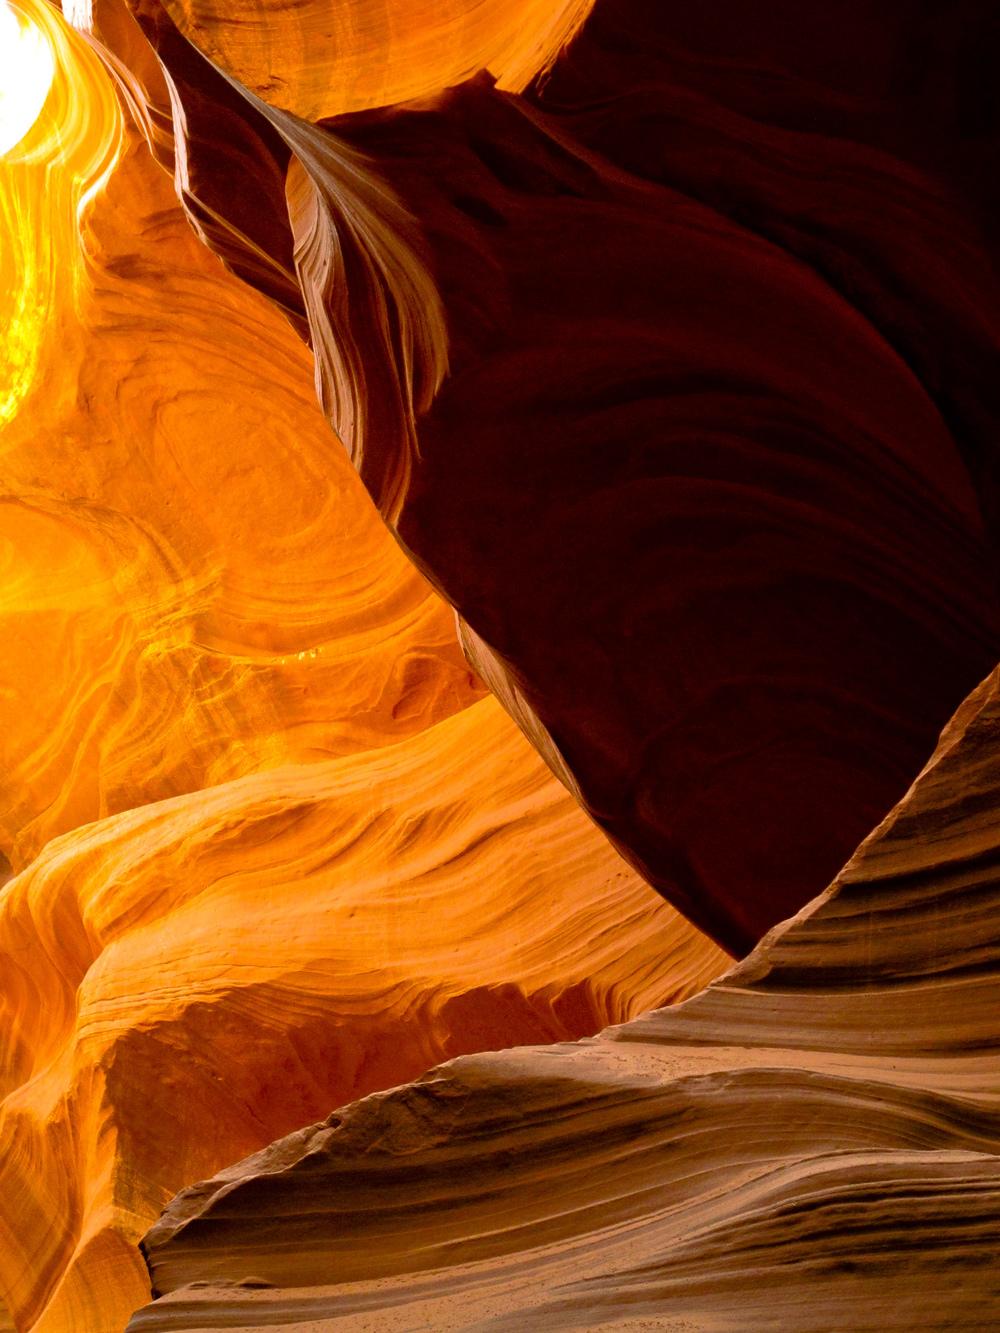 Arizona_Travel_007.JPG